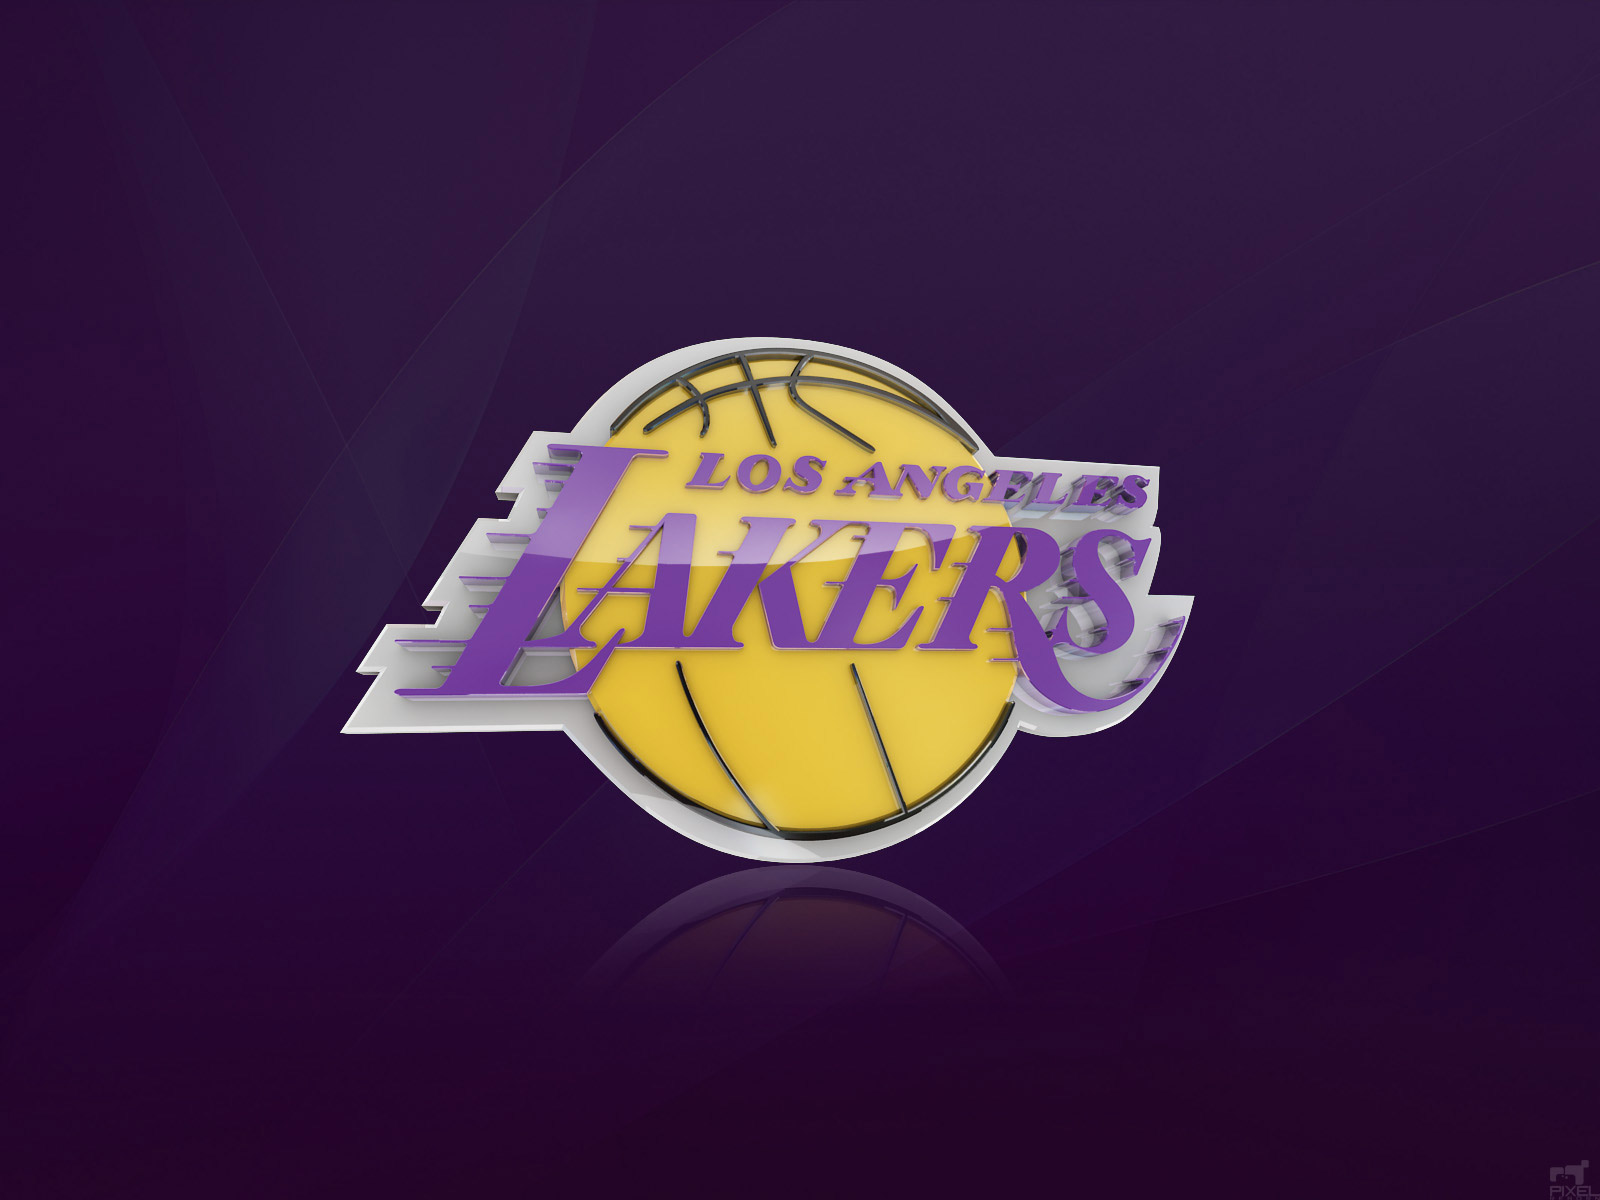 http://1.bp.blogspot.com/-OGjHtCV8JA4/UXCRBWQG_fI/AAAAAAAAaPY/ZgUkdOHjdqY/s1600/la-lakers-d-logo-wallpaper.jpg